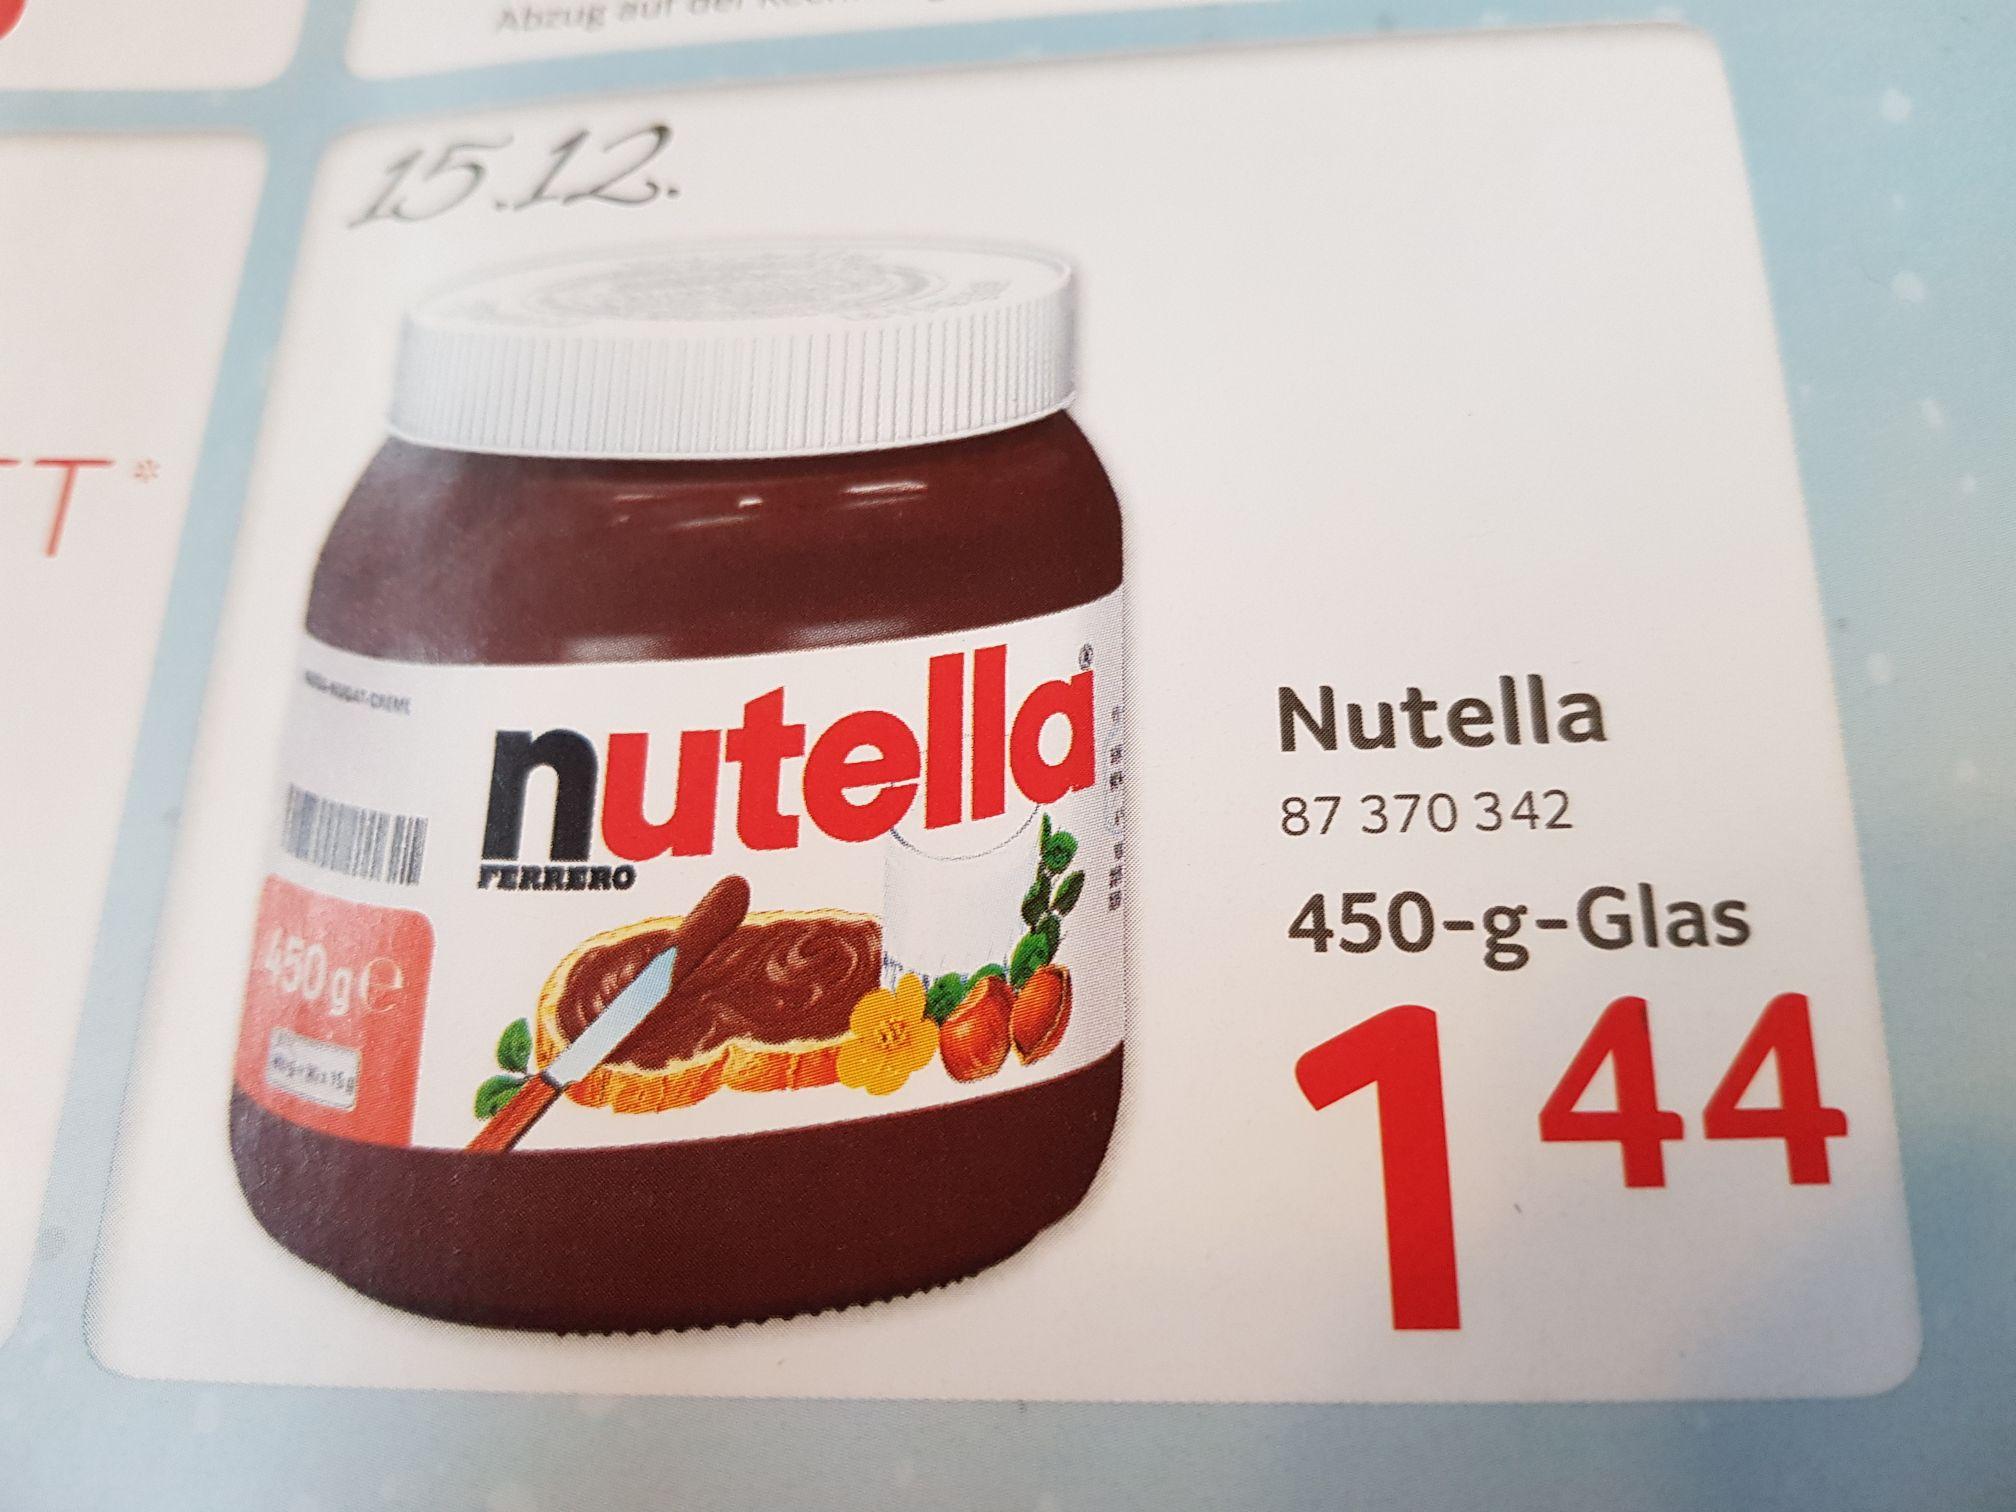 Endlich mal wieder Nutella 1,54 Euro - Selgros NUR AM 15.12.